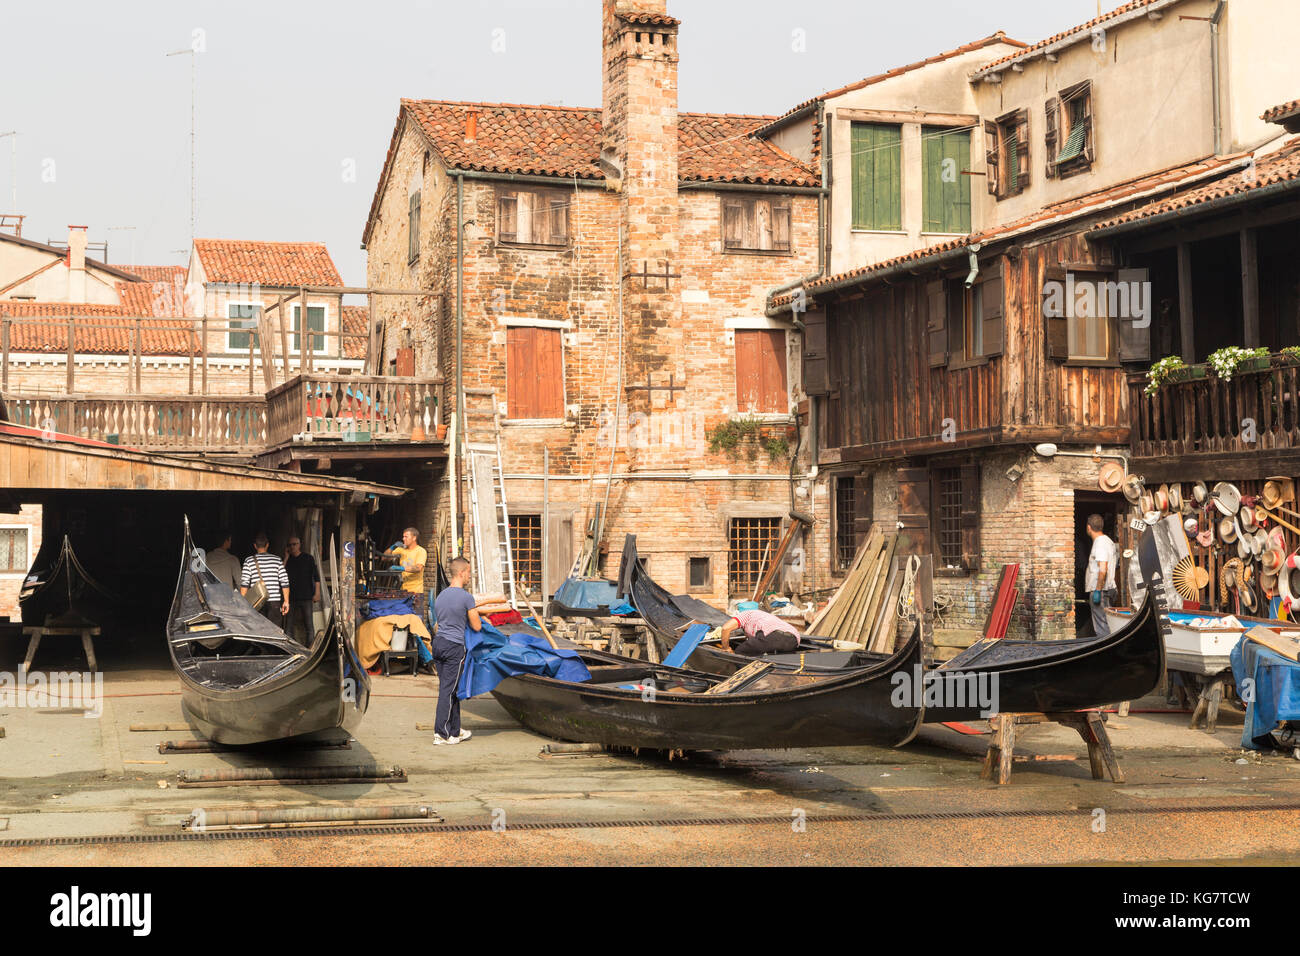 Italy, Venice, dry dock maintenance yard for gondolers. - Stock Image